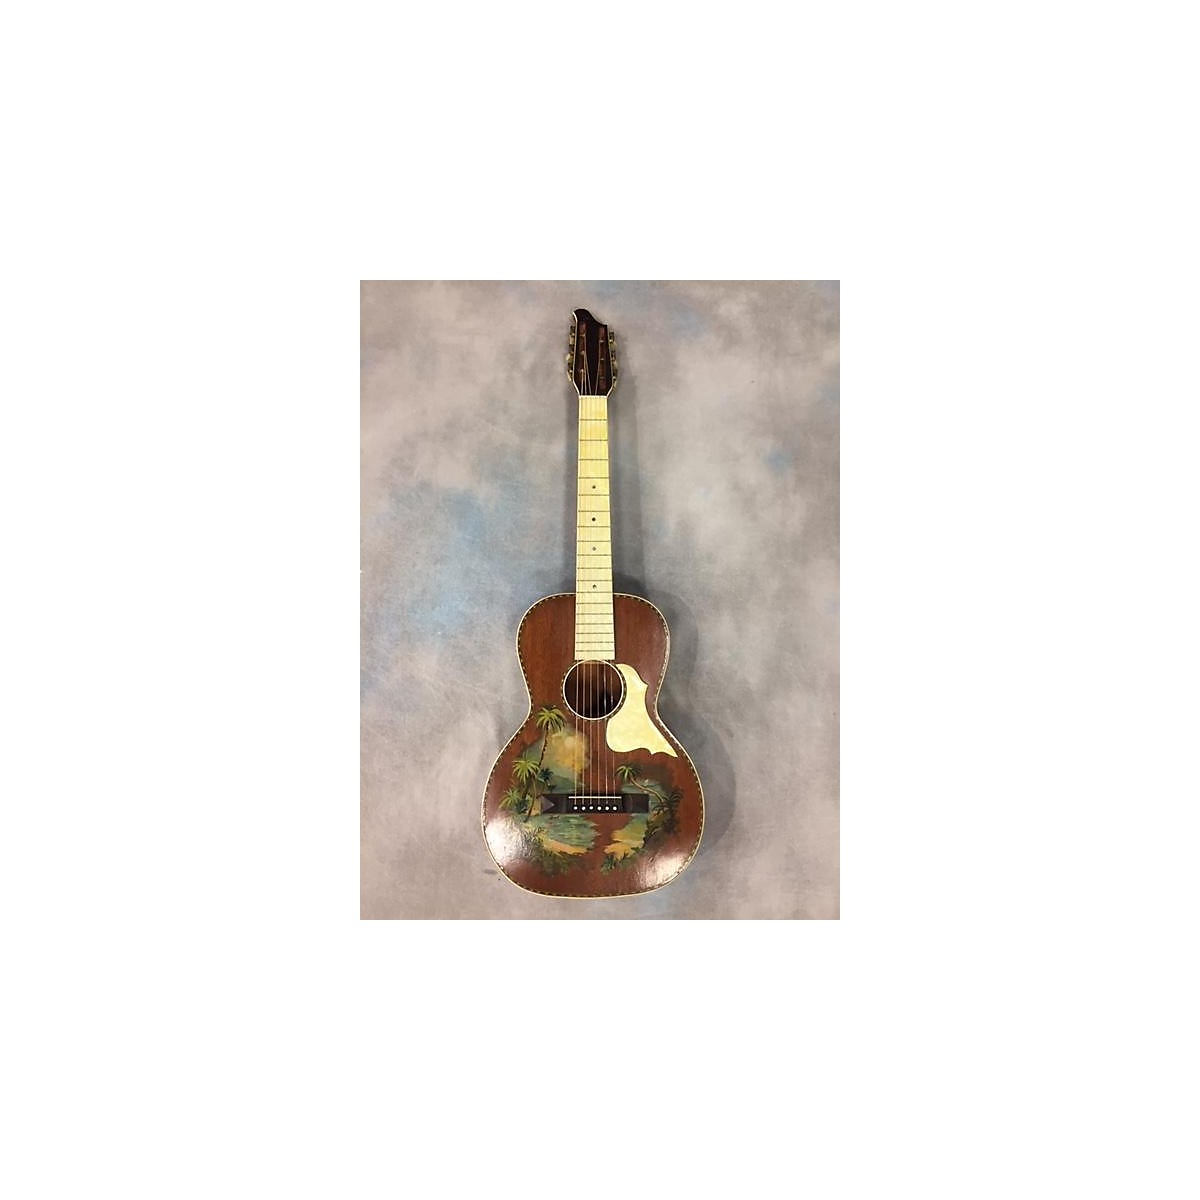 In Store Vintage Vintage 1928 Stromberg Viocinet Hawaiian Parlor Vintage Natural Acoustic Guitar